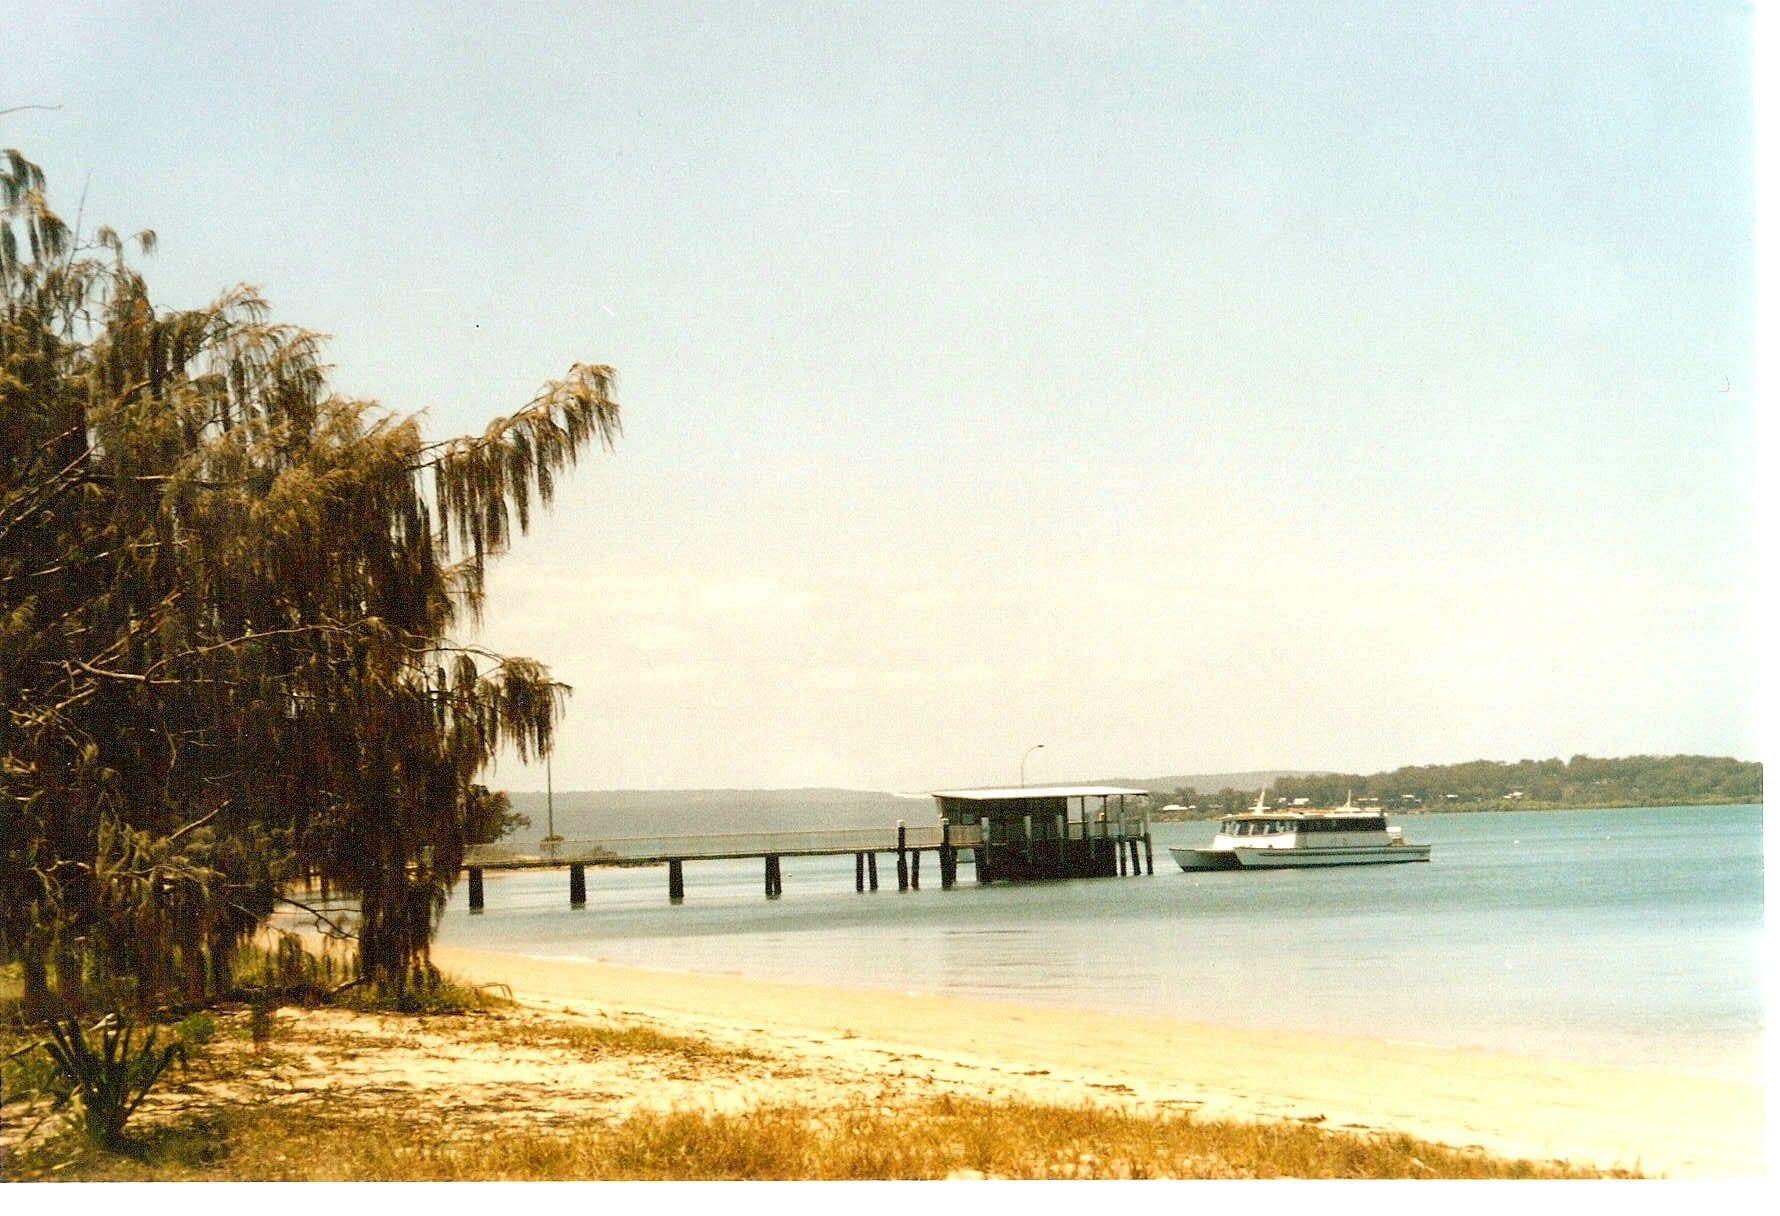 Coochiemudlo Island Foreshore